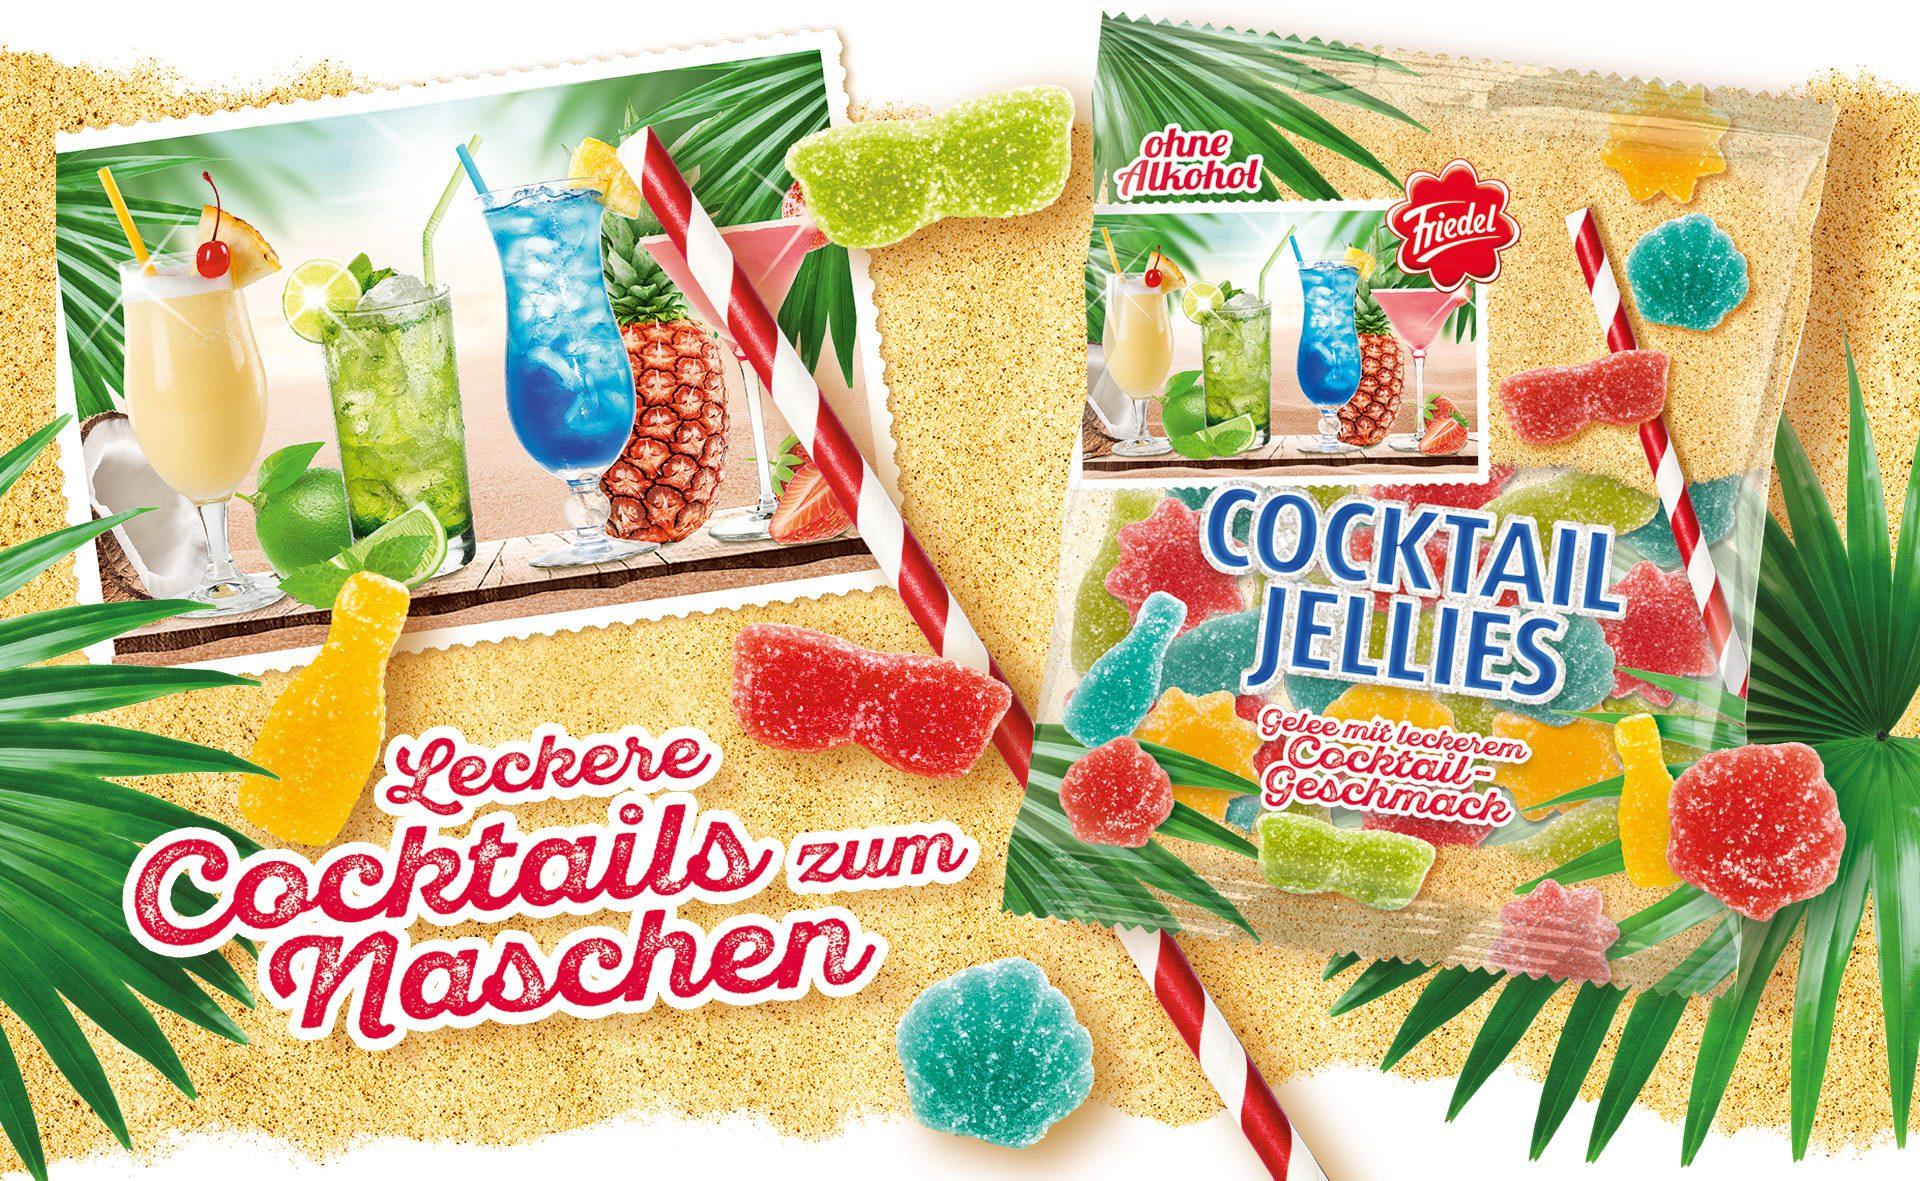 Verpackungsdesign Malvega - Referenz: CocktailJellies, Friedel